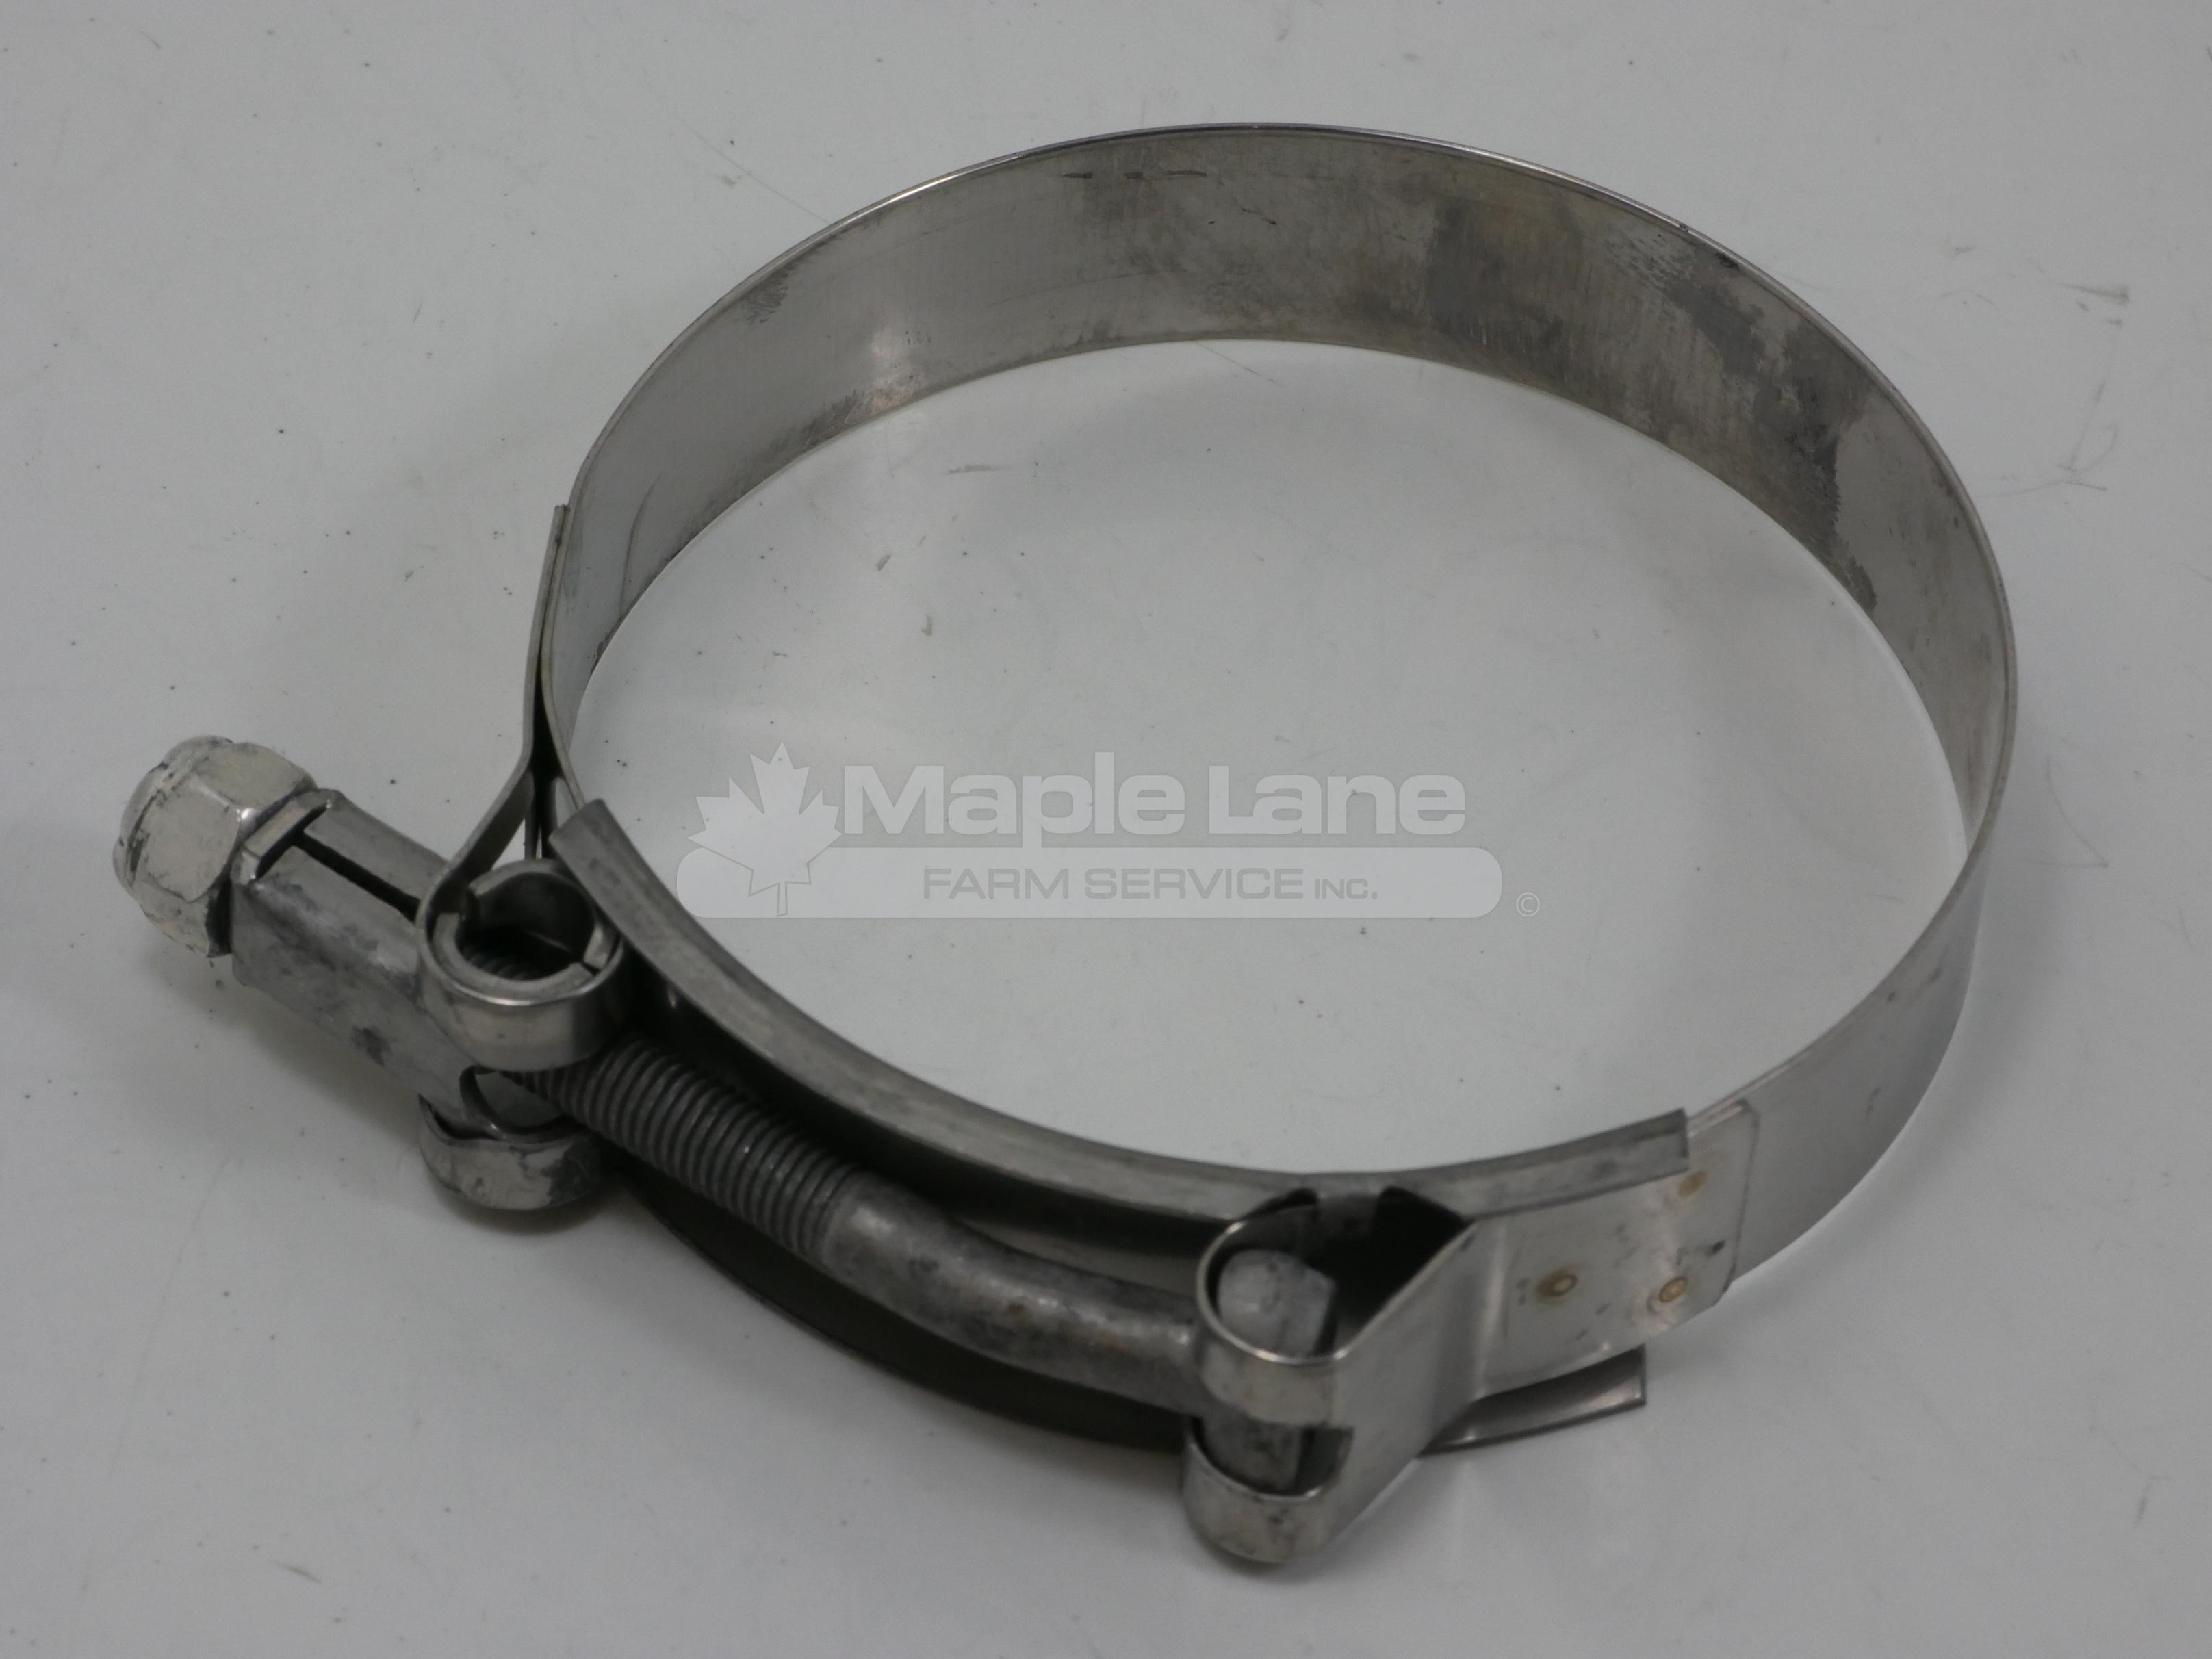 AG561243 Super Gear Hose Clamp